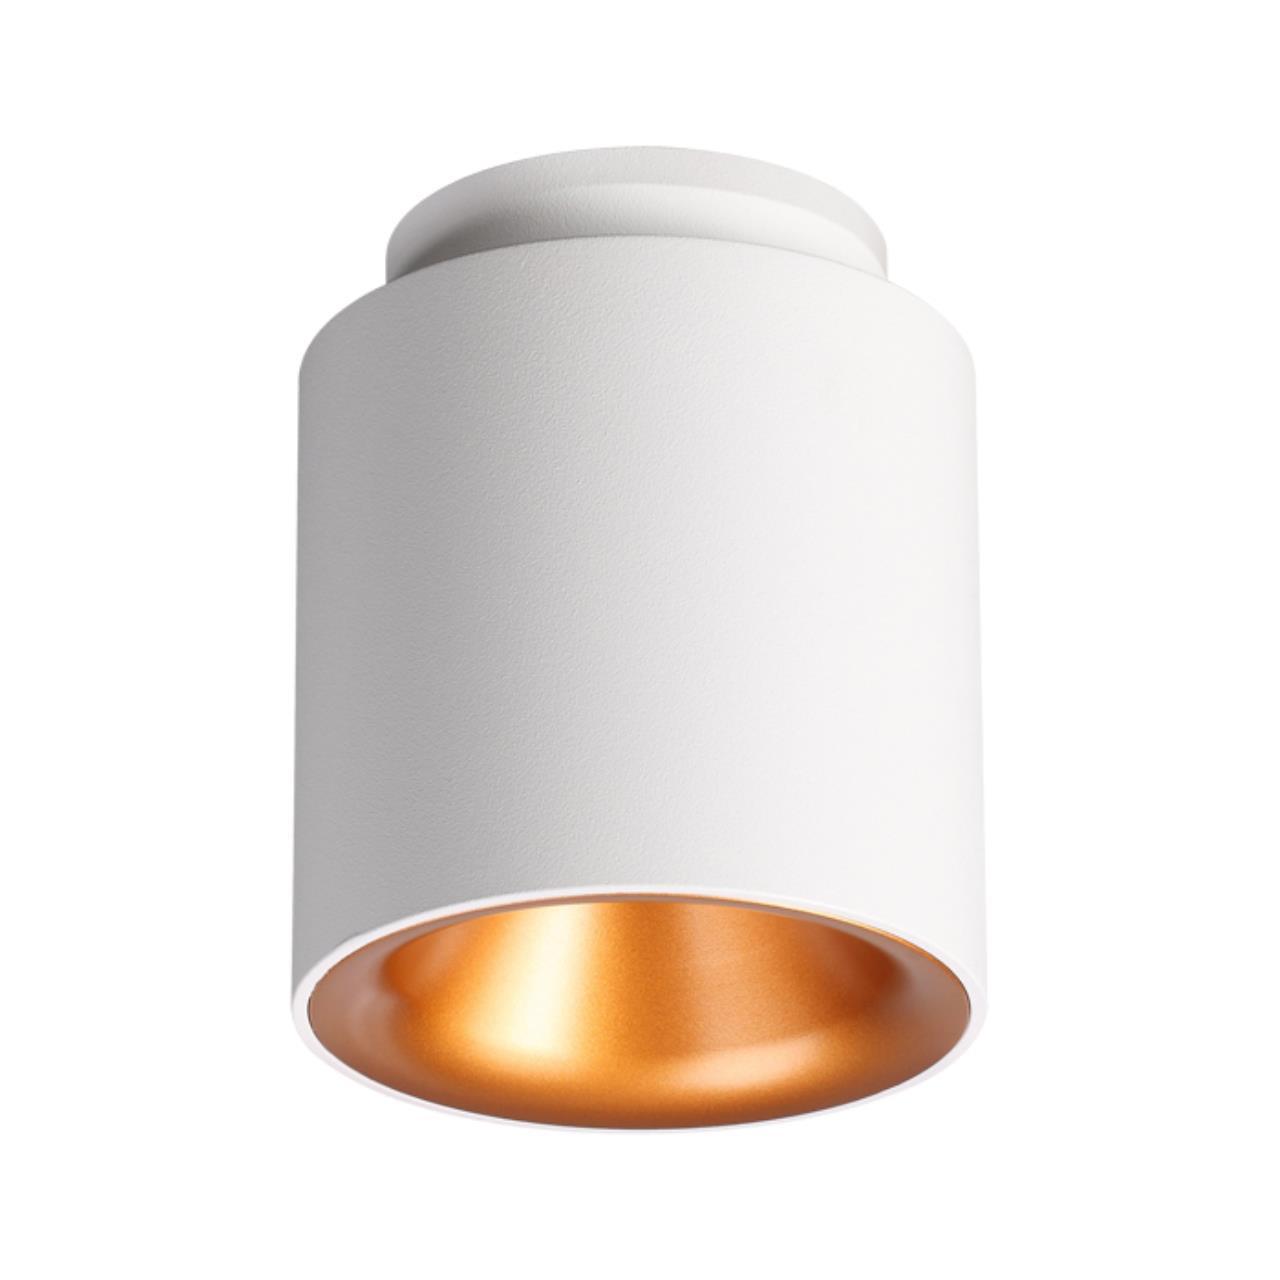 358158 OVER NT19 024 белый/золото Накладной светильник IP20 LED 3000K 9W 220V ORO